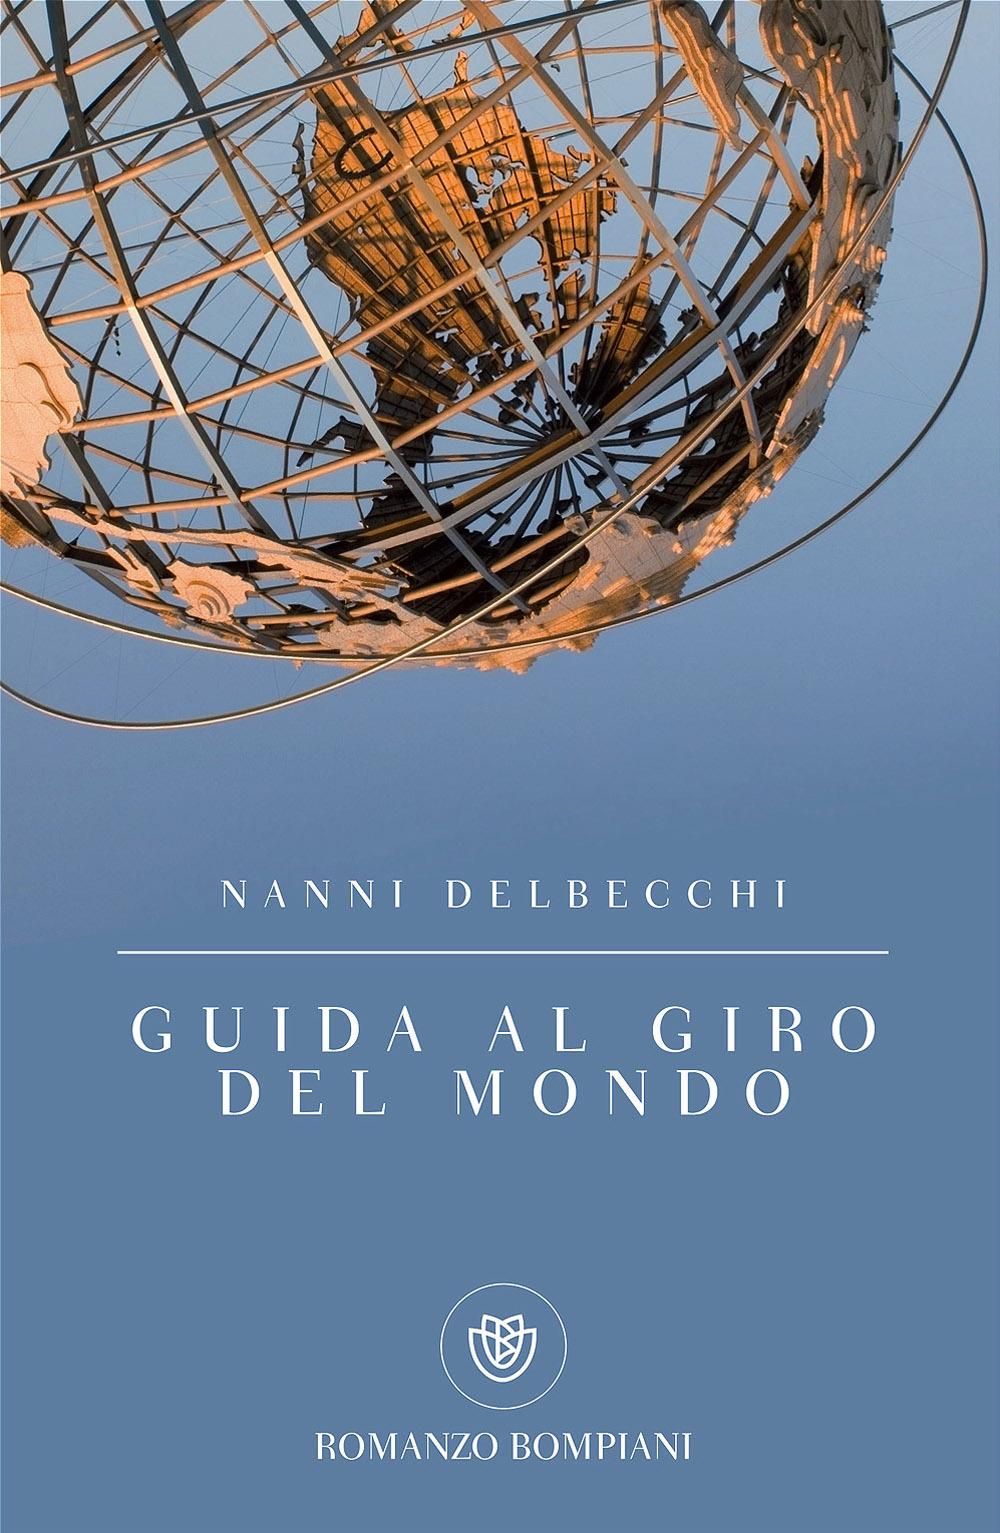 GUIDA AL GIRO DEL MONDO - 9788845283246